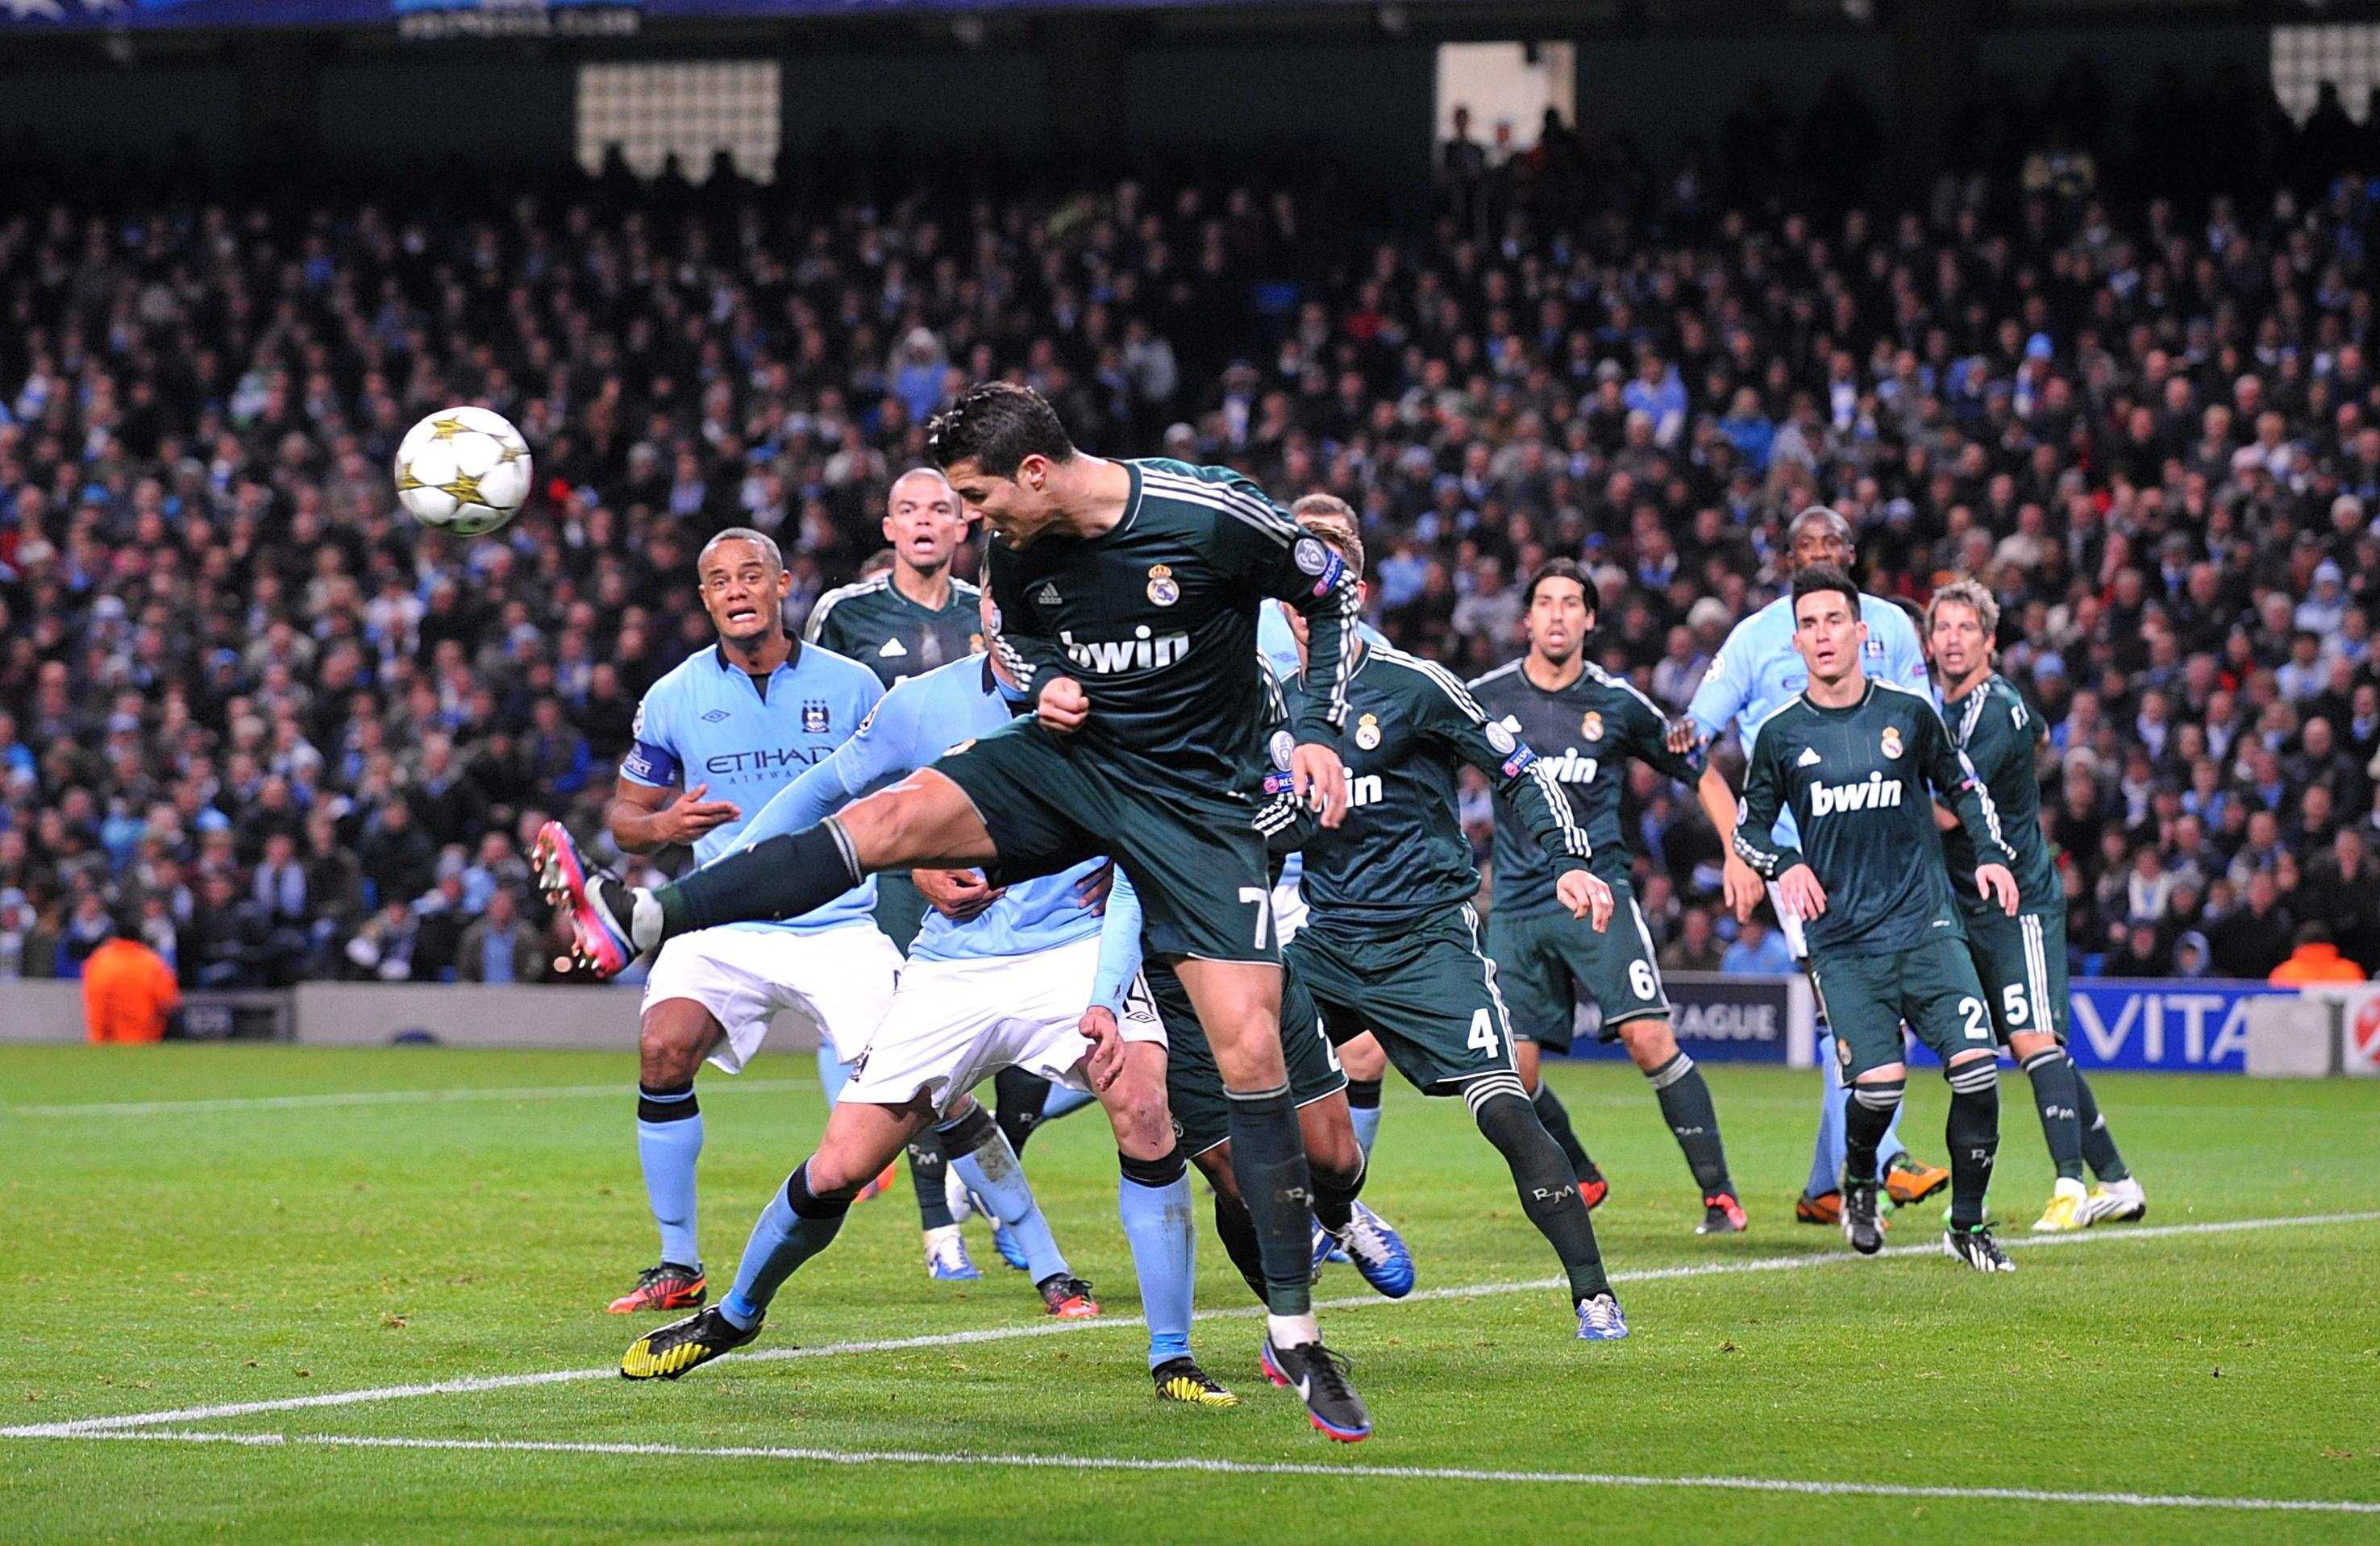 Soccer - UEFA Champions League - Group D - Manchester City v Real Madrid - Etihad Stadium